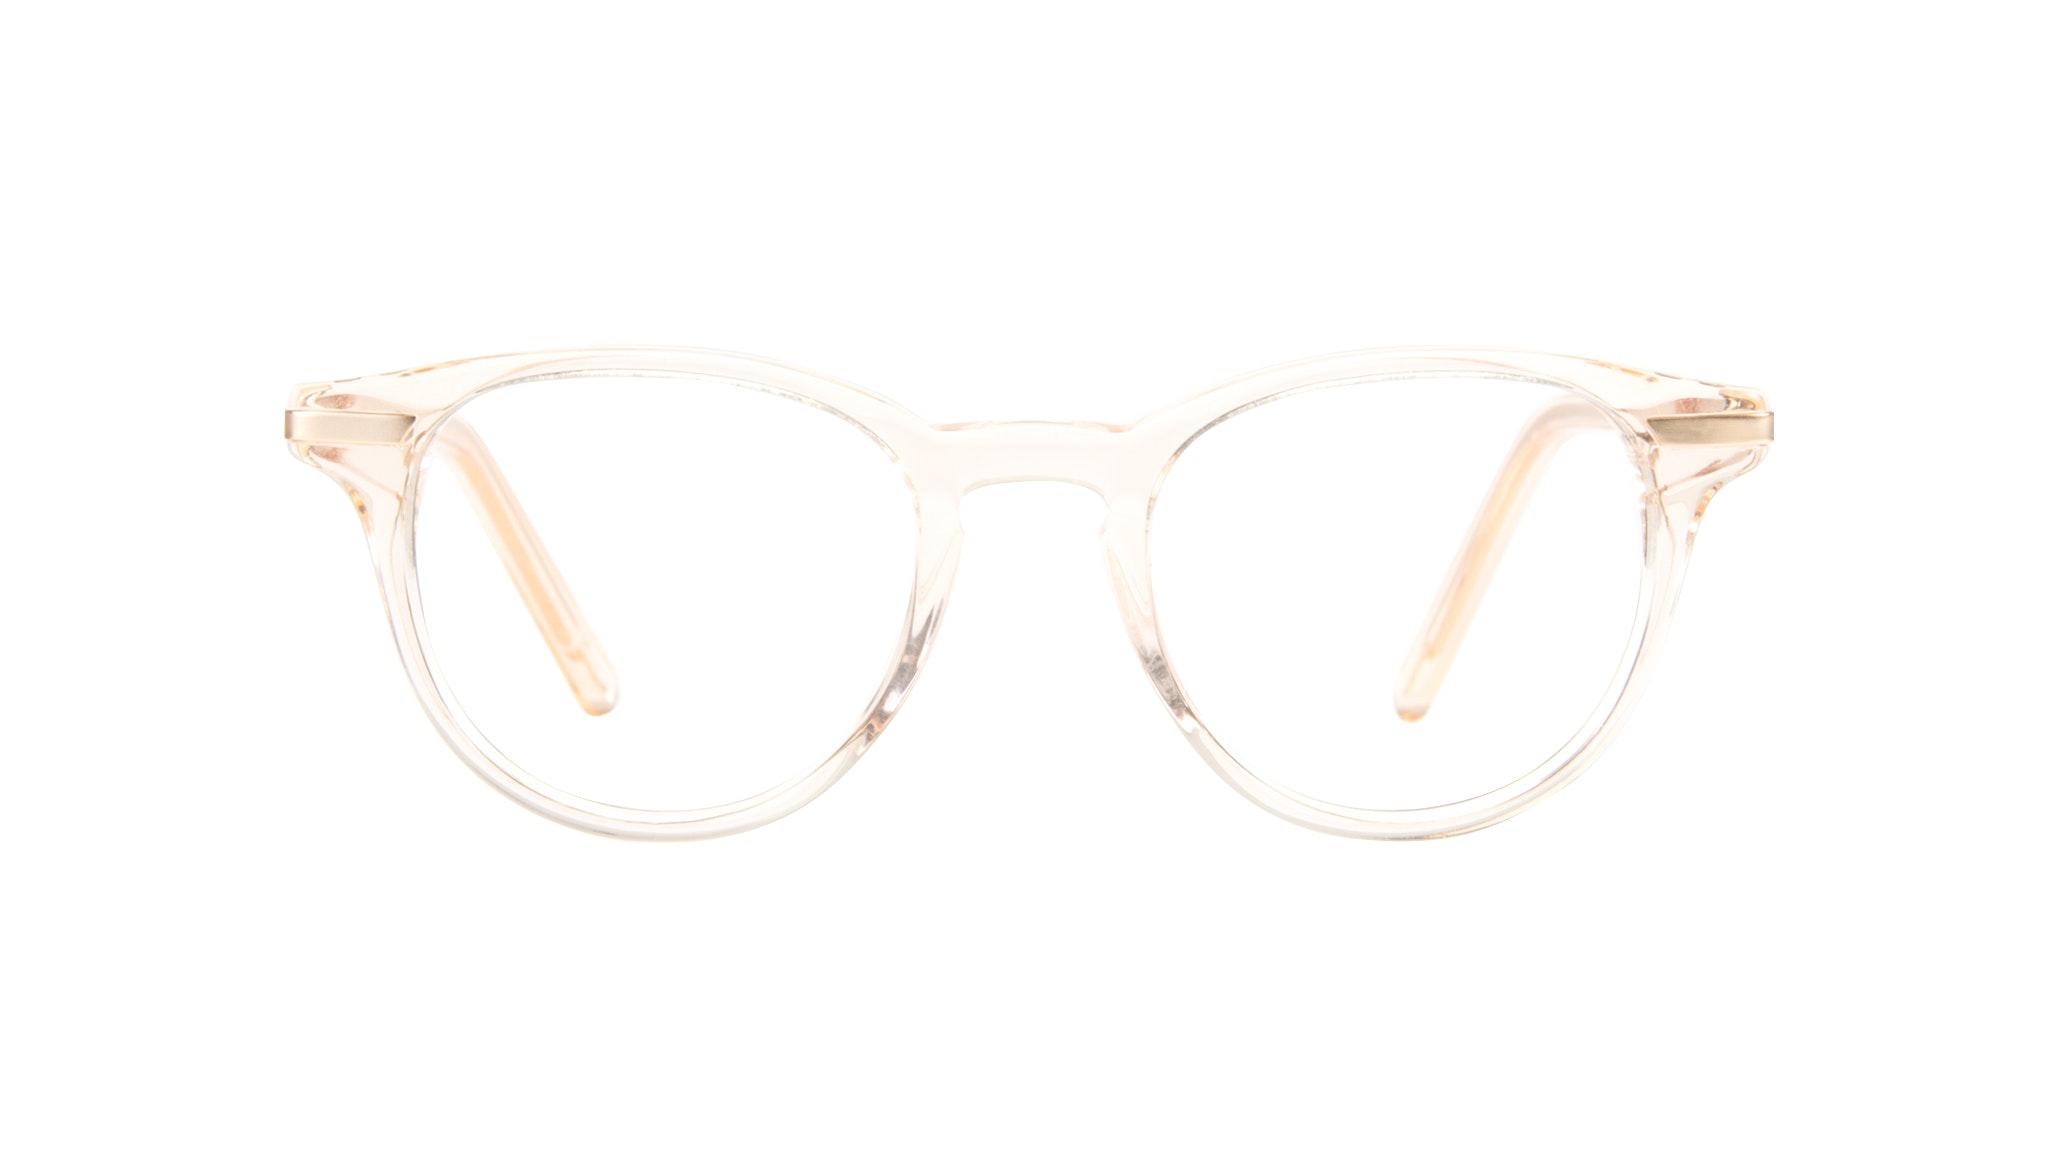 Affordable Fashion Glasses Round Eyeglasses Women Spark Blond Front